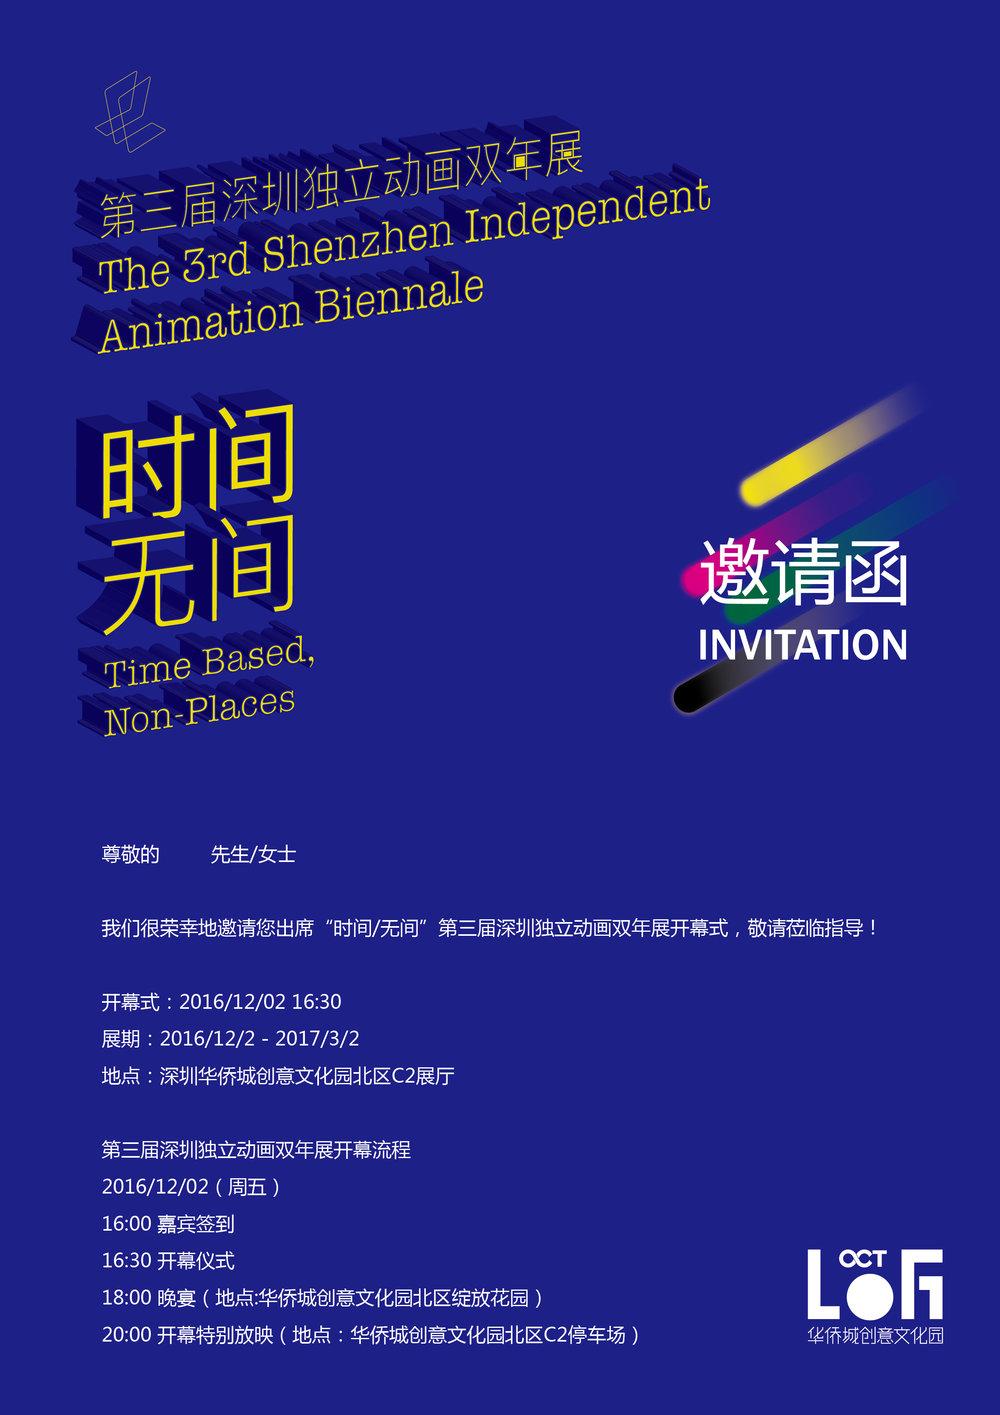 第三届深圳独立动画双年展 Third Shenzhen Independent Animation Biennial  -